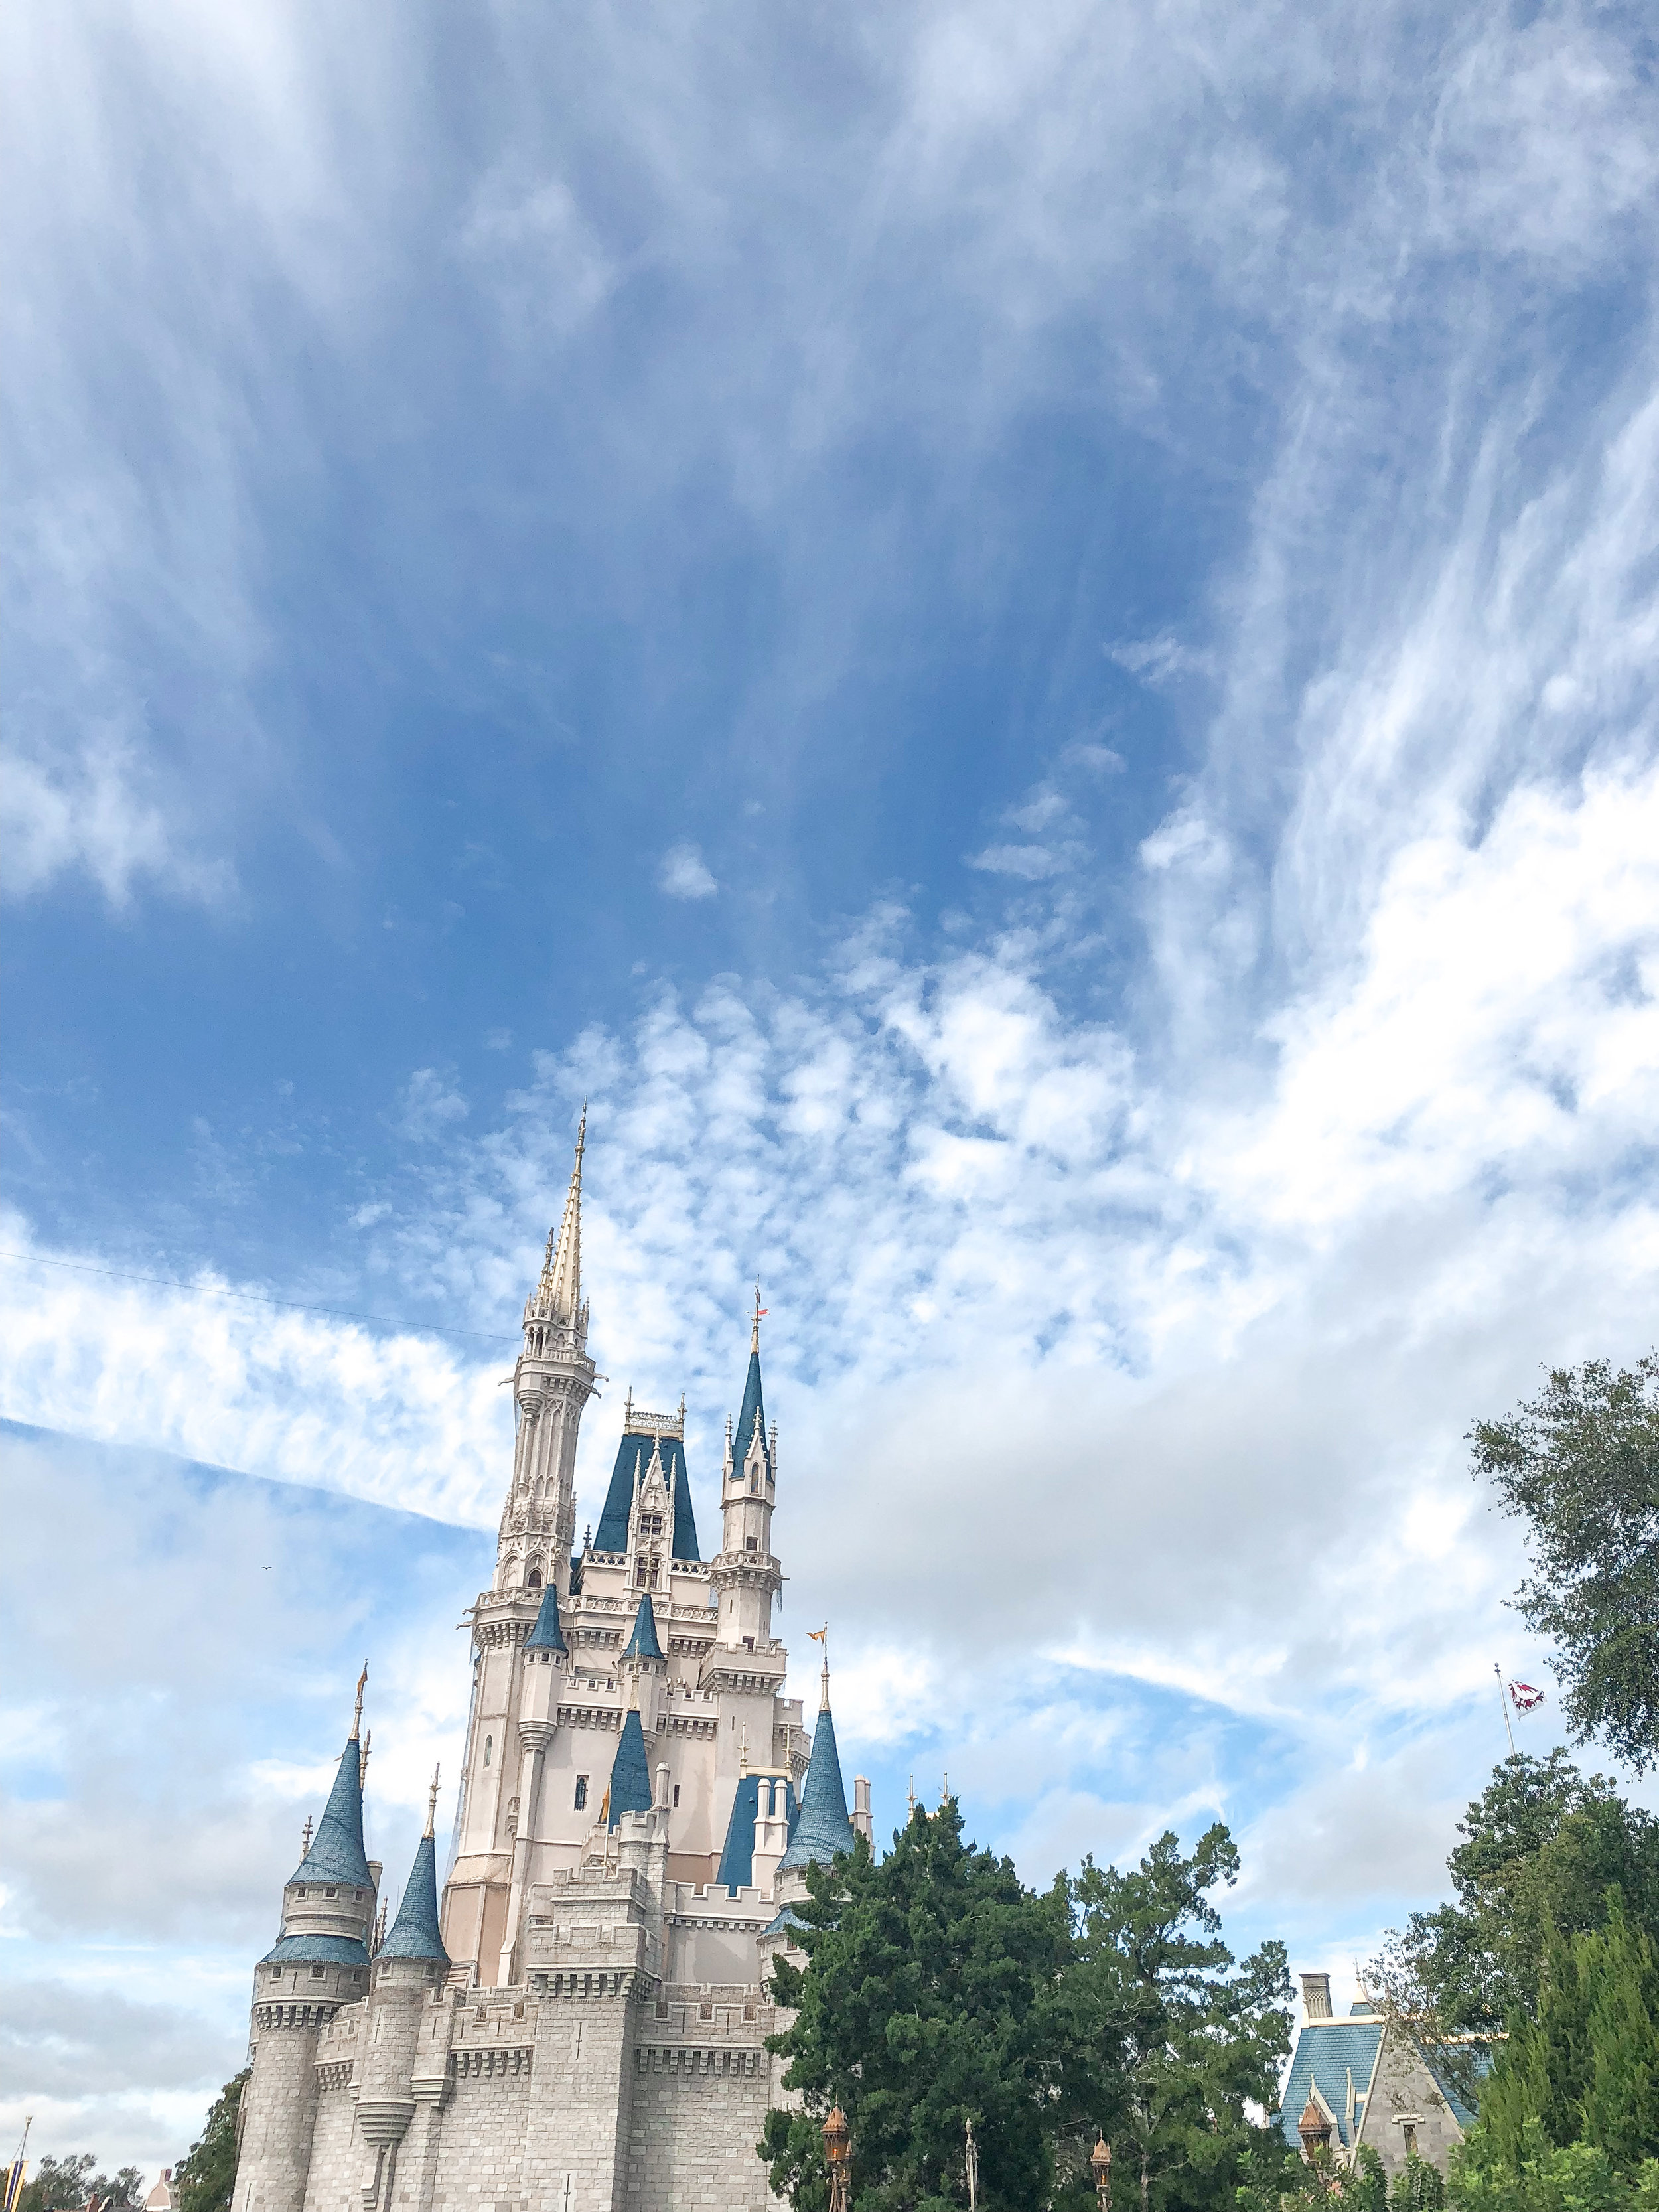 The prettiest sight you ever did see - Cinderella Castle at Disney's  Magic Kingdom .